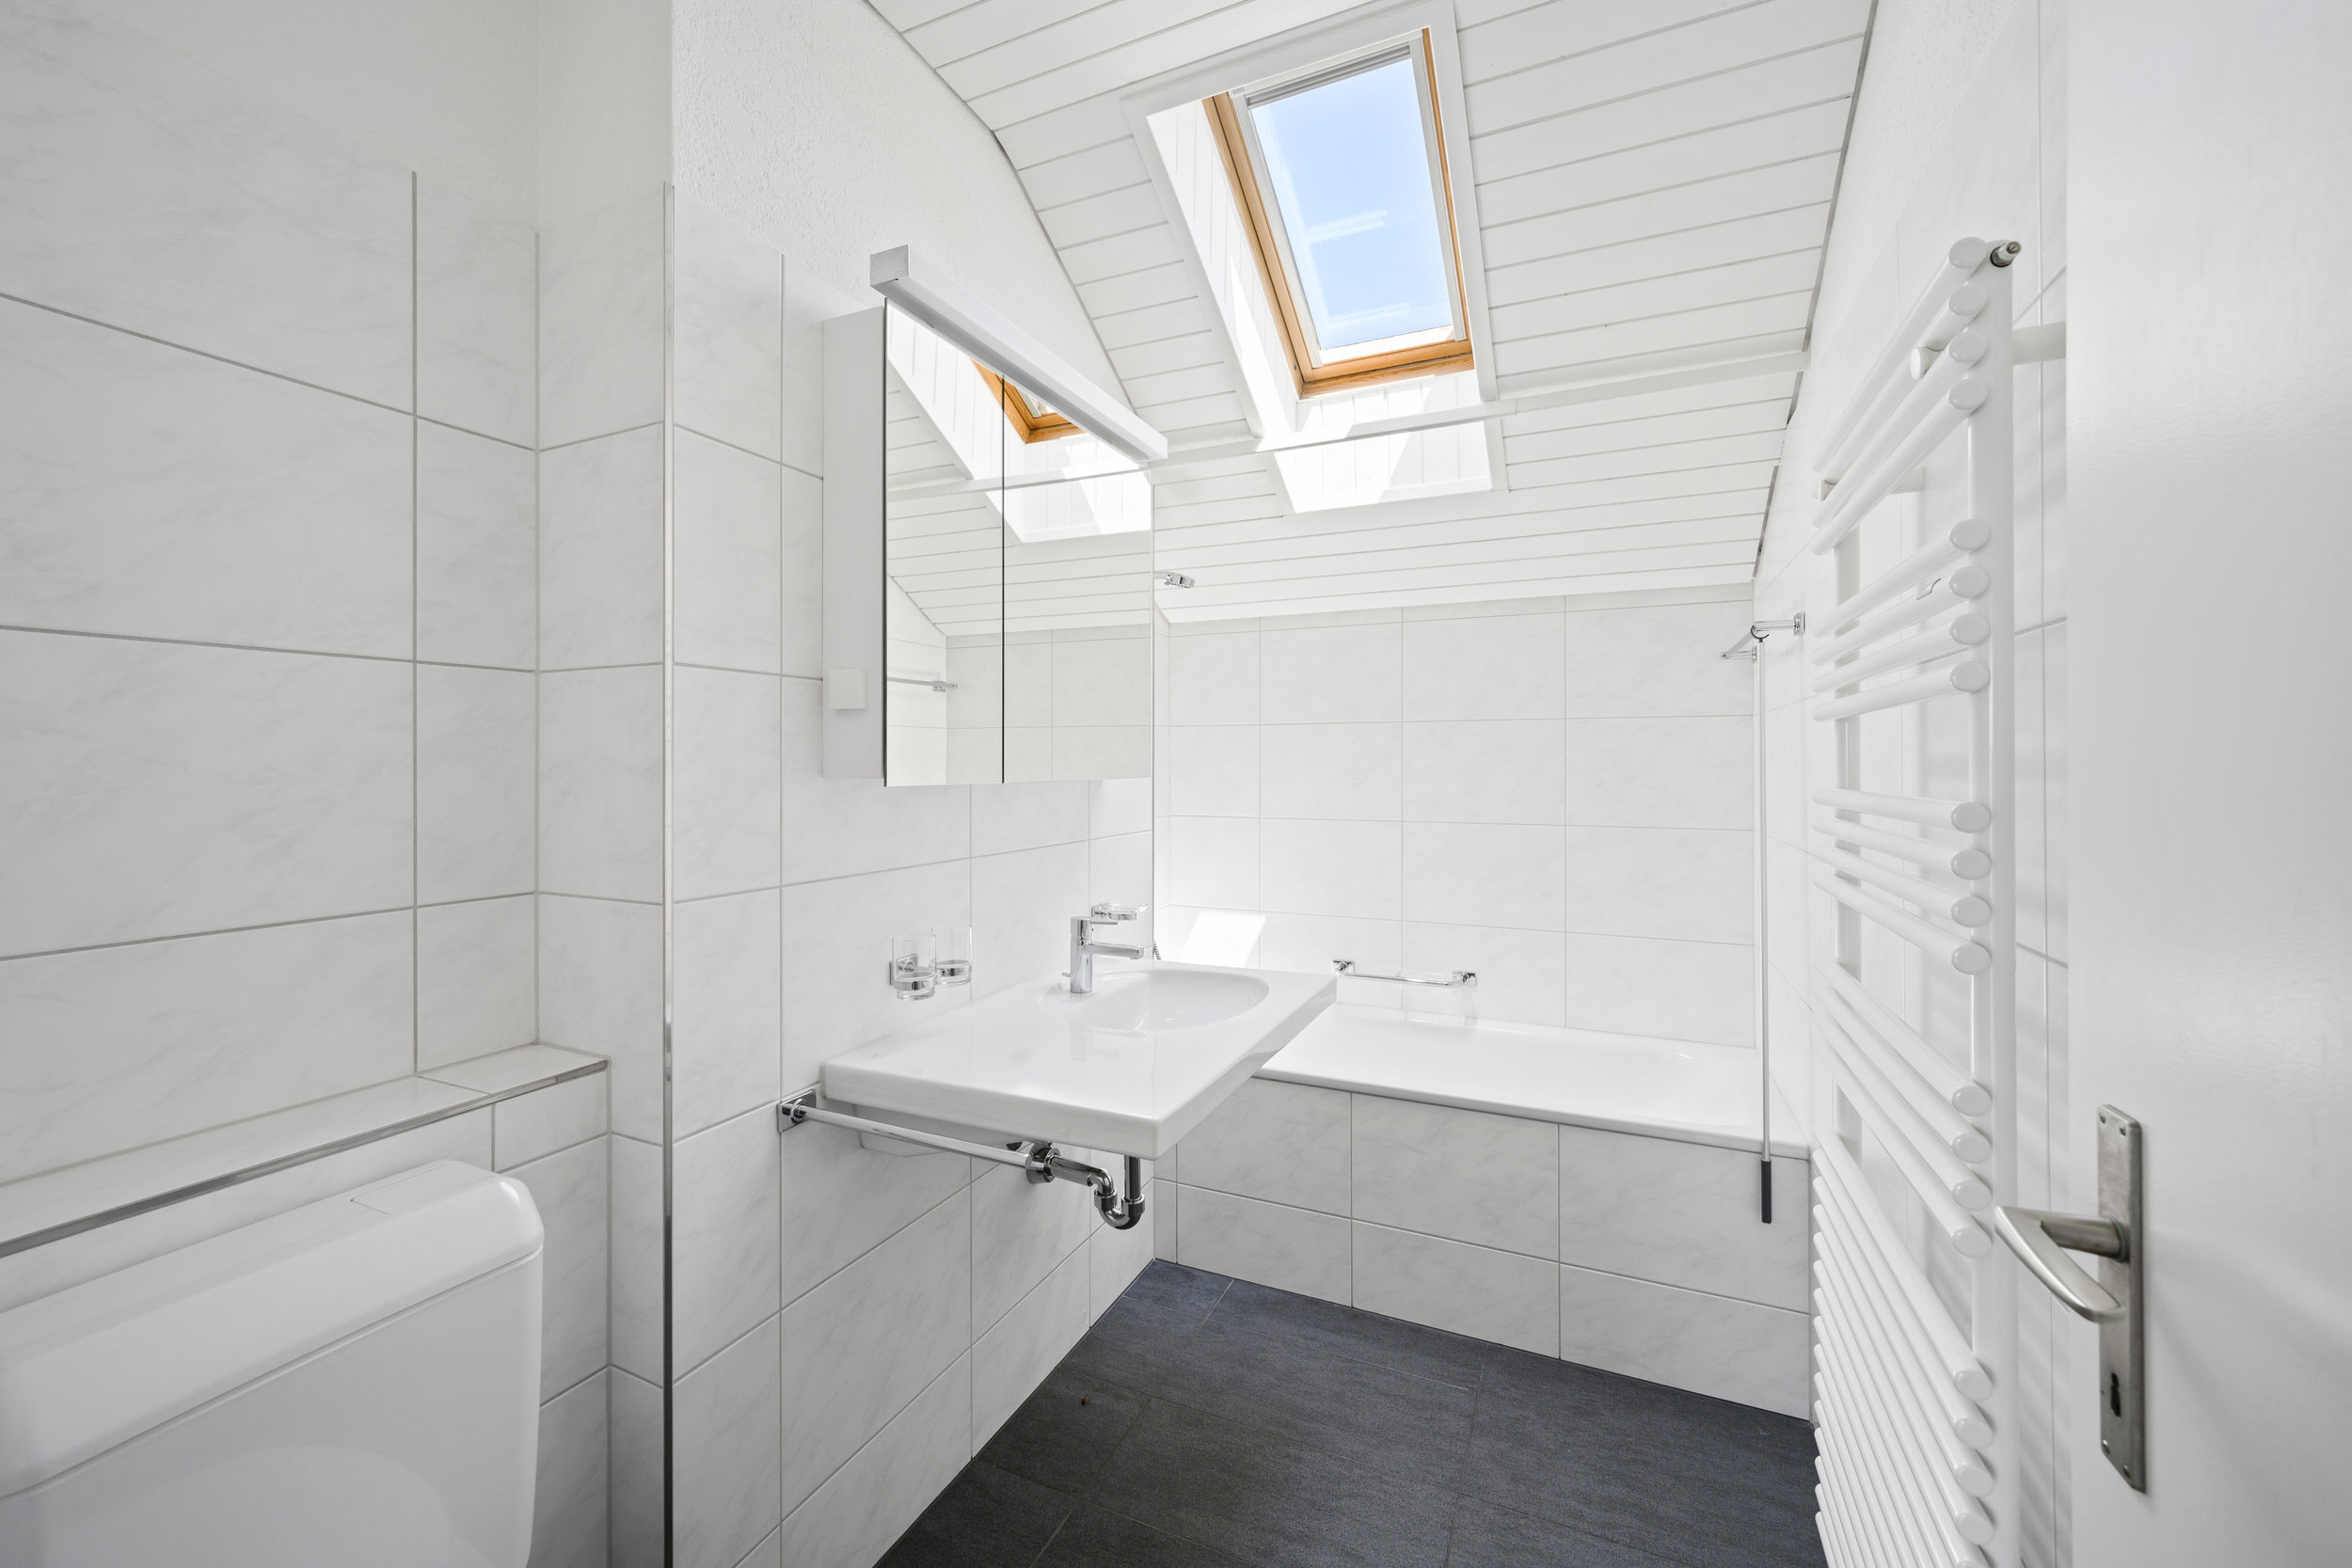 Immobilienfotograf Bern 1.jpg